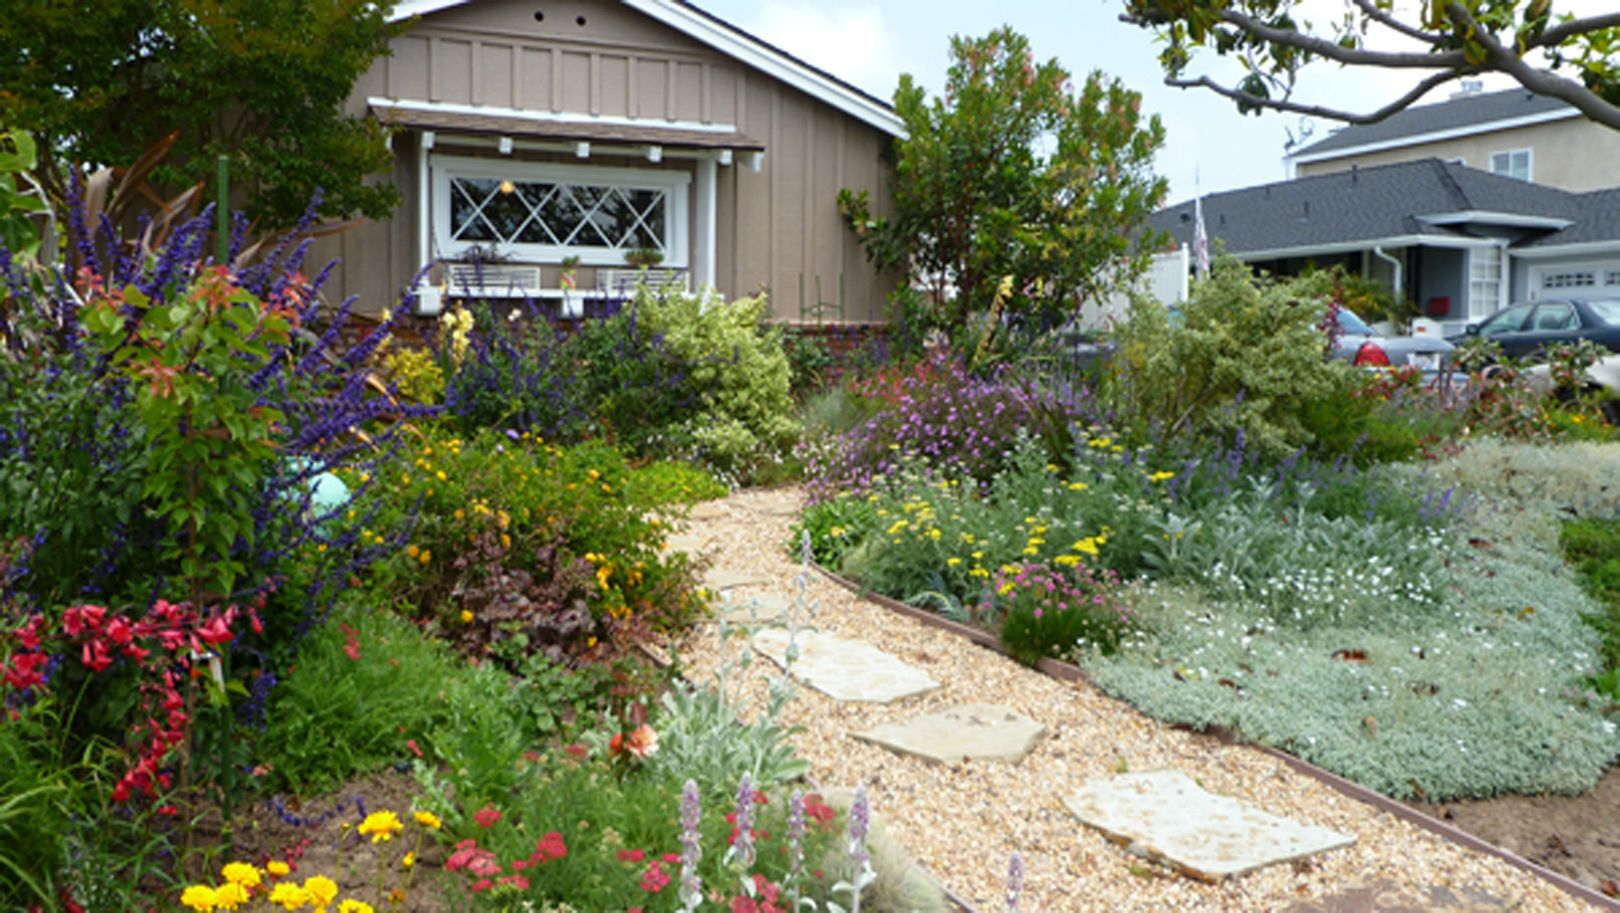 No grass front yard! | My Work: Botanica Landscape | Pinterest on No Grass Backyard  id=56638